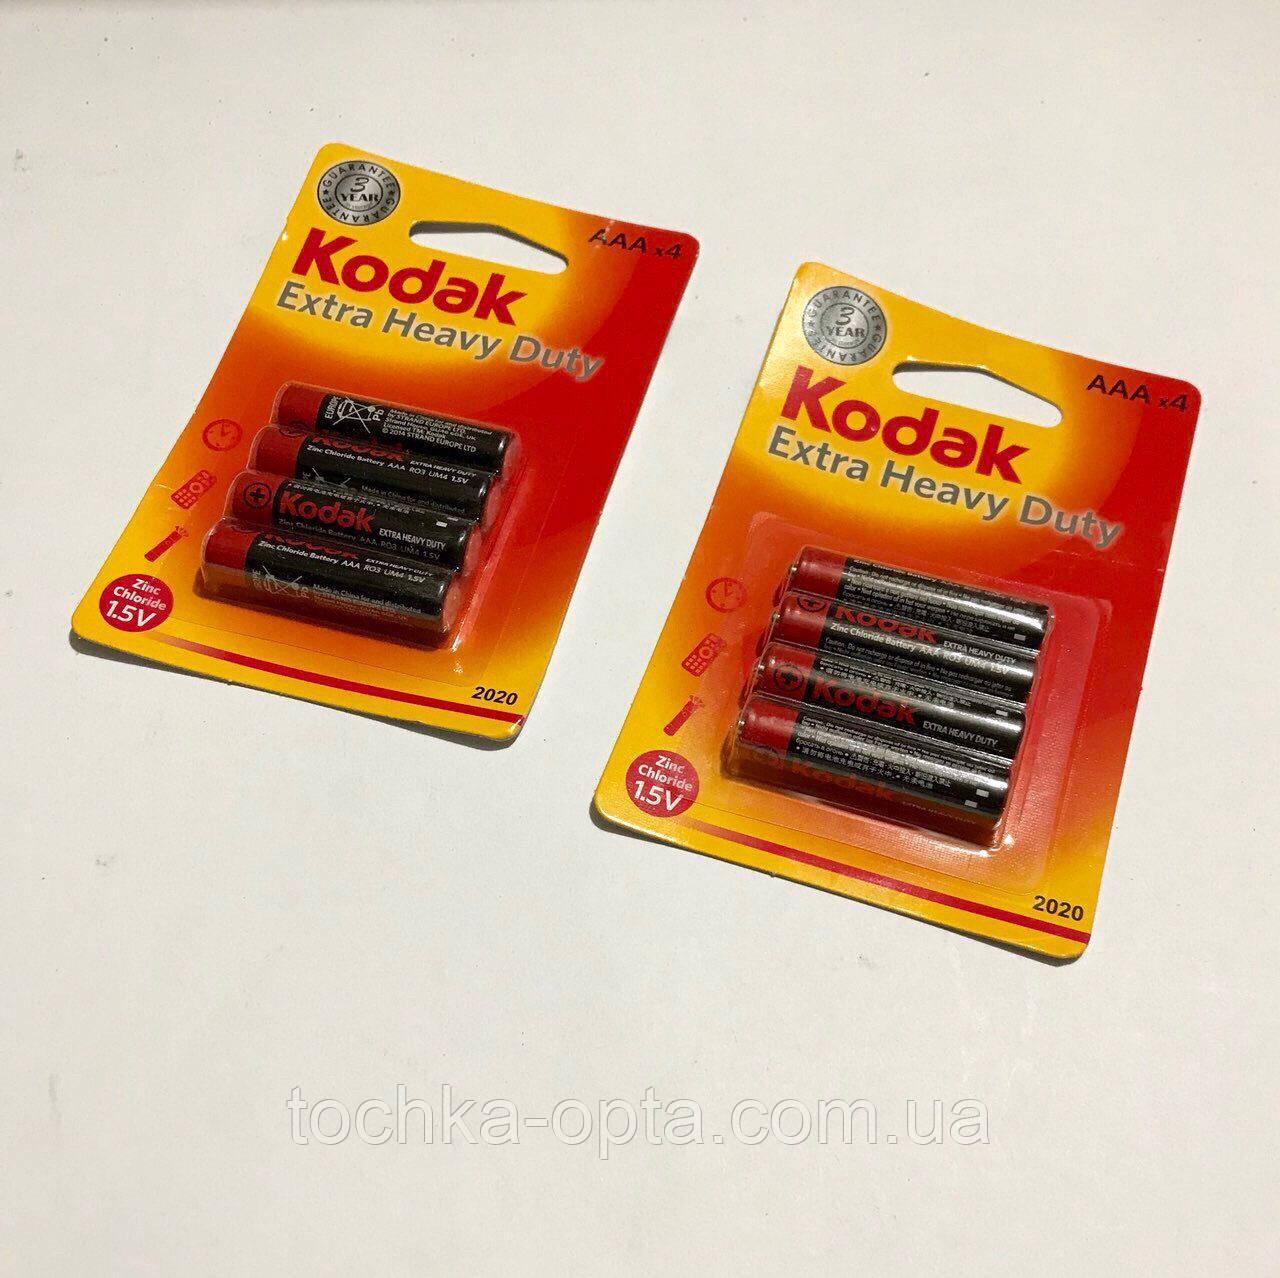 Батарейки пальчиковые Kodak R06 на планшете